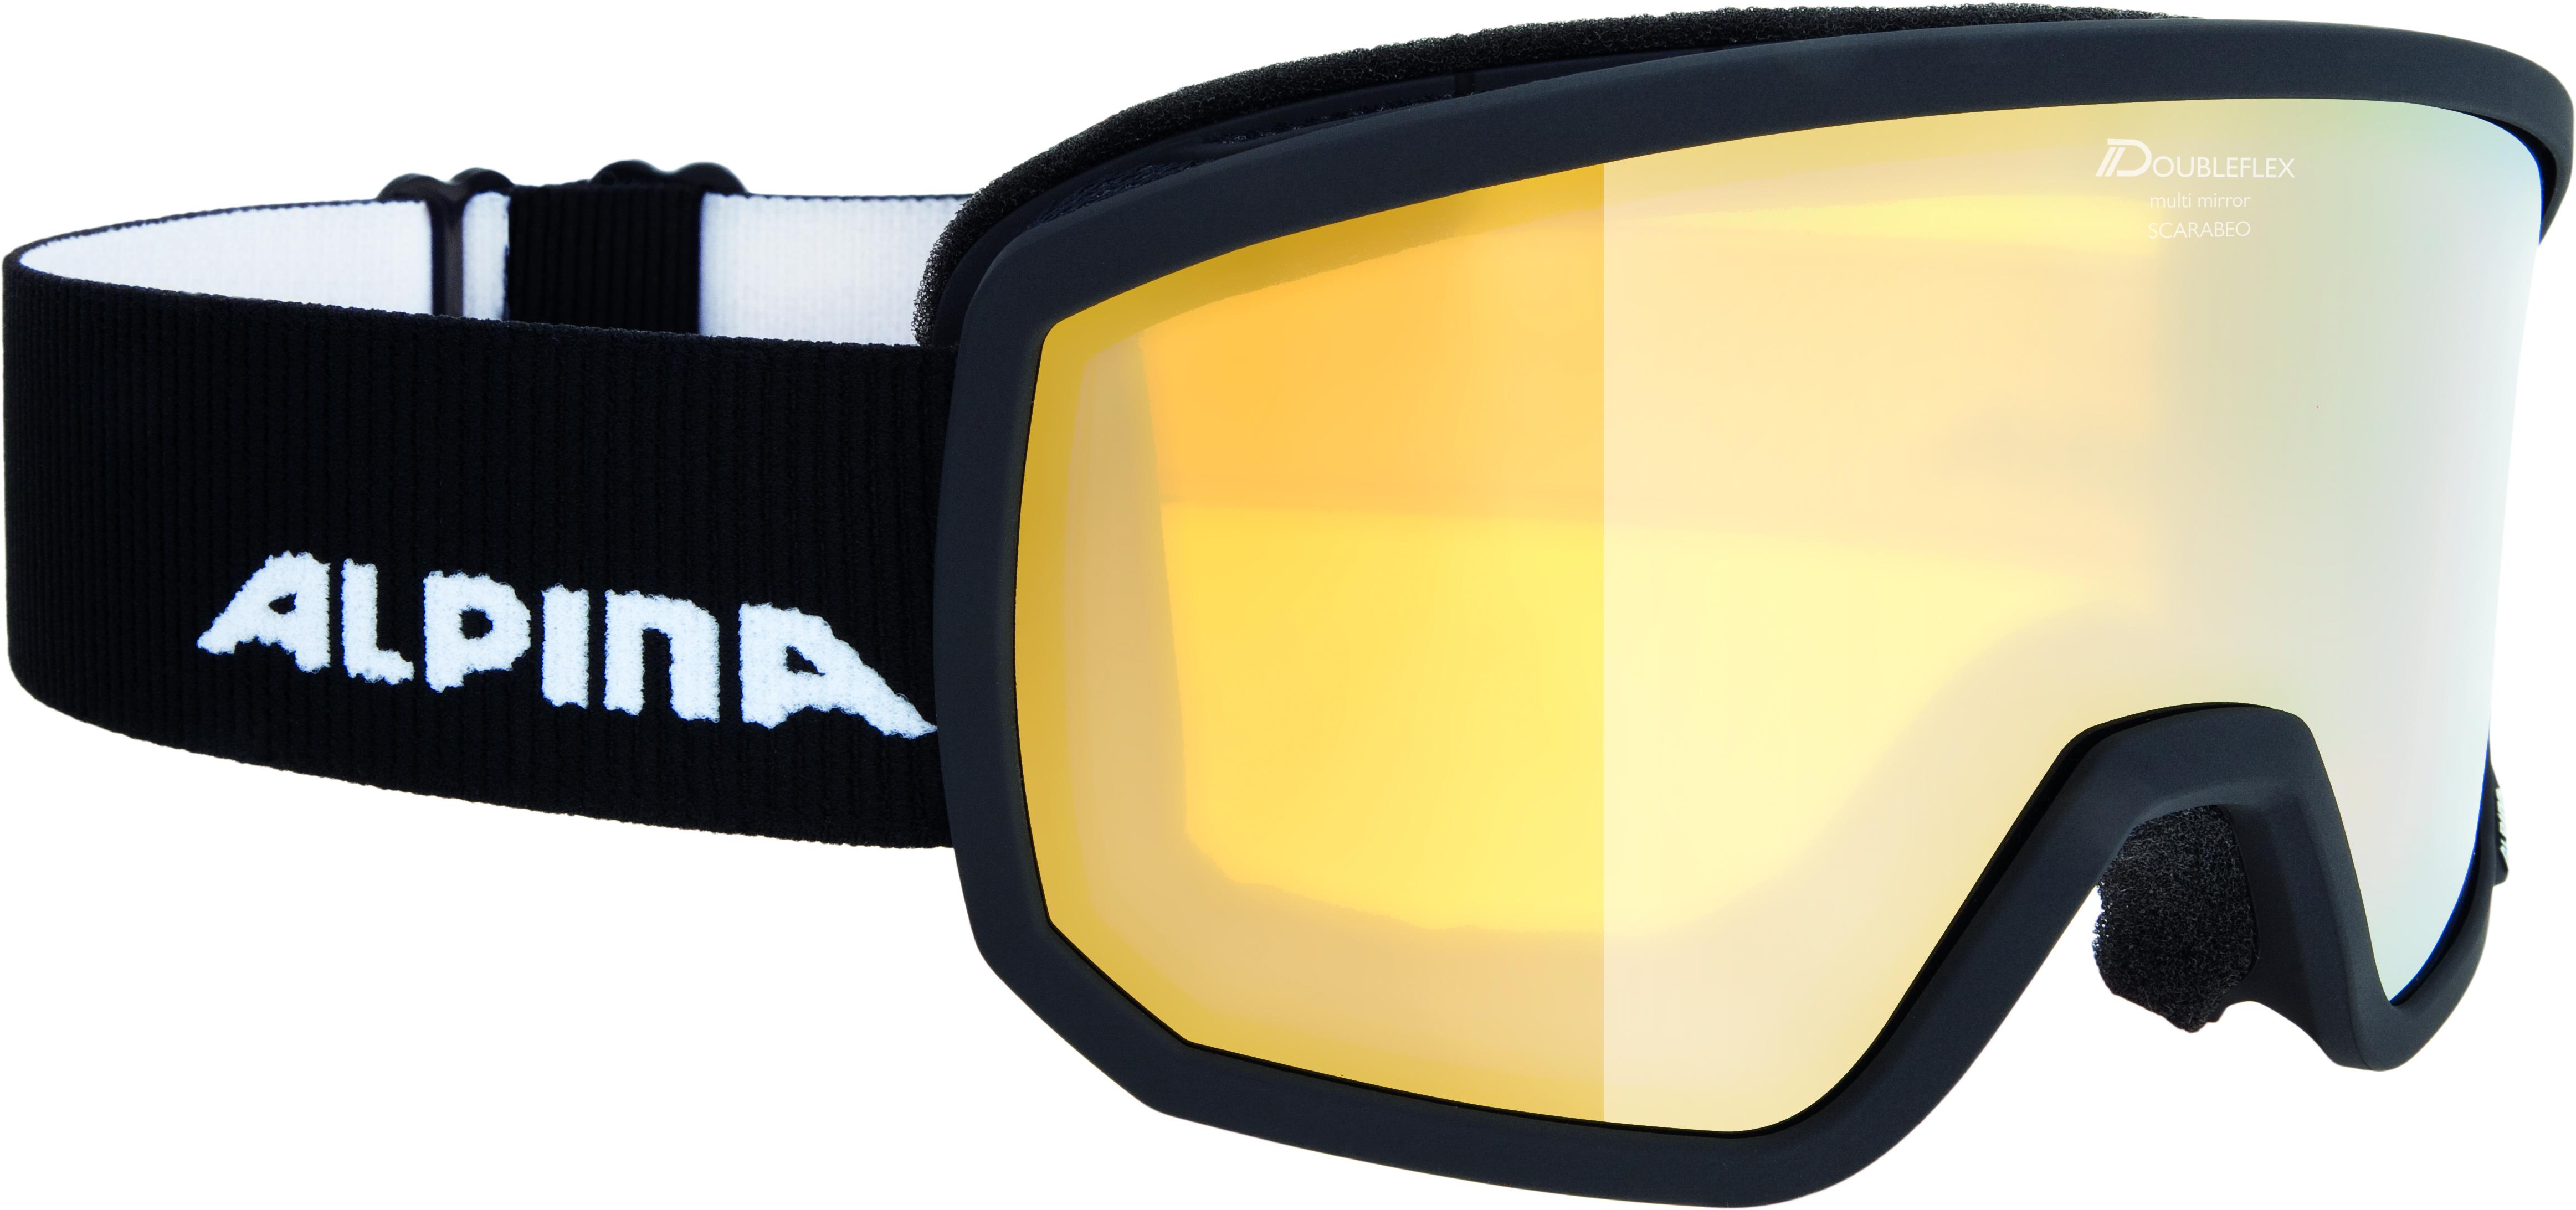 Купить Очки горнолыжные Alpina SCARABEO MM zyl. black matt MM gold zyl. S2 / MM gold zyl. S2 (L50)